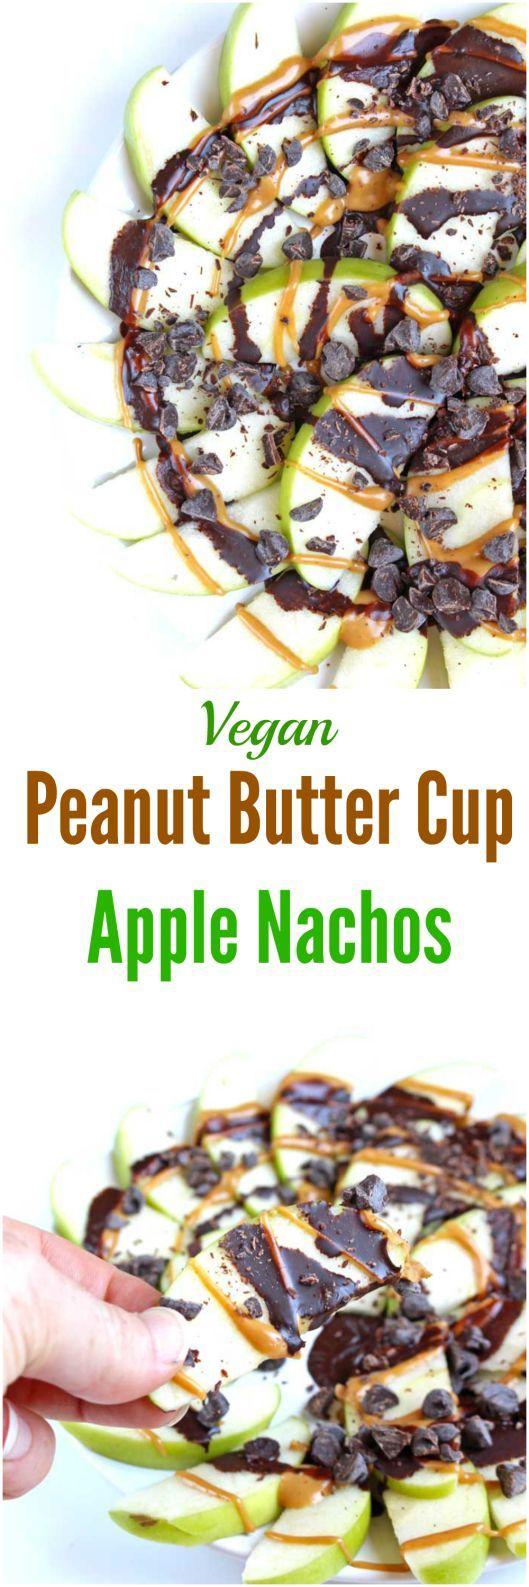 Peanut Butter Cup Apple Nachos [Vegan]